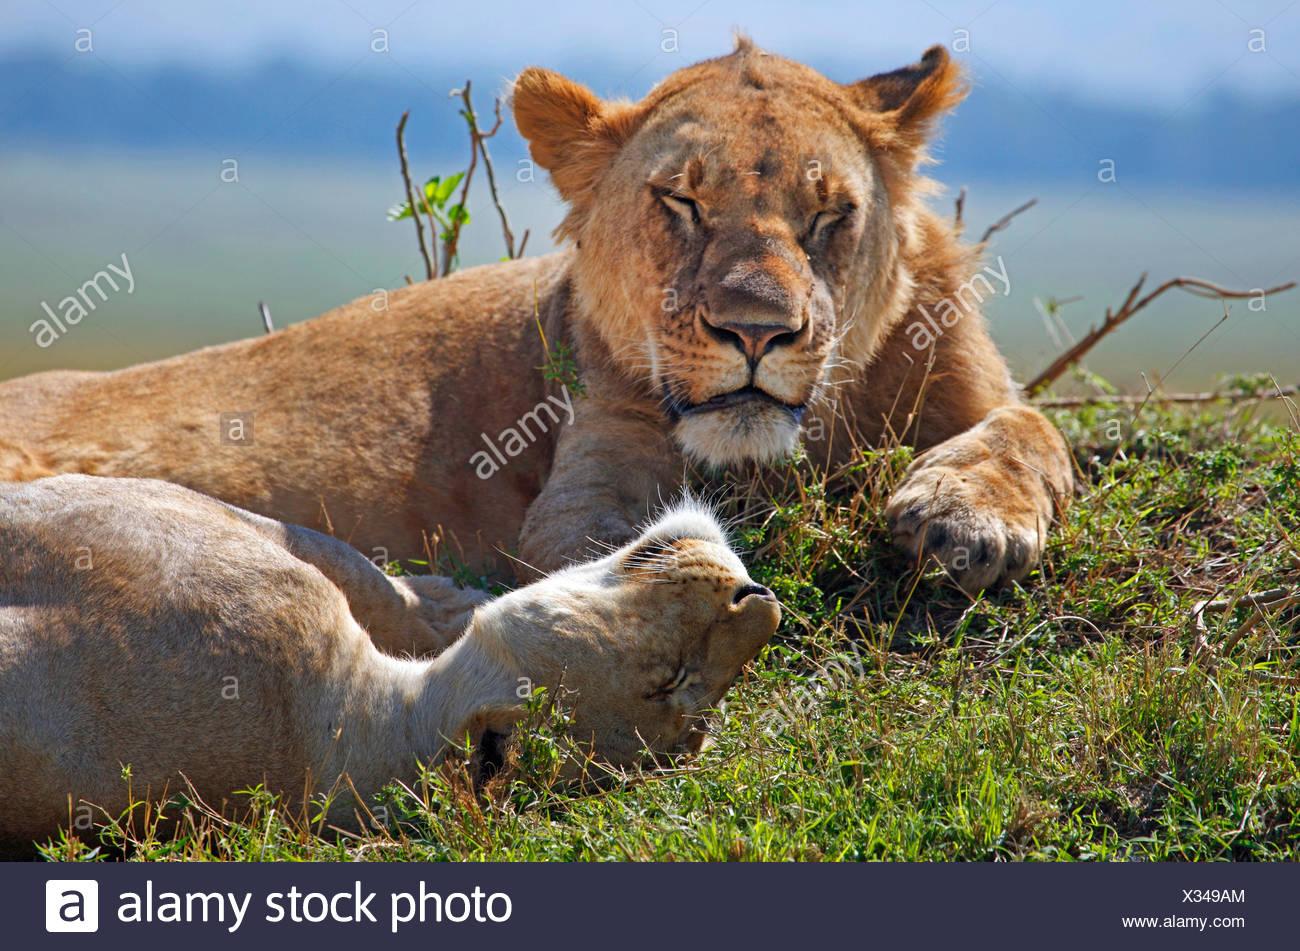 lion (Panthera leo), two dozing lions, Kenya, Masai Mara National Park - Stock Image